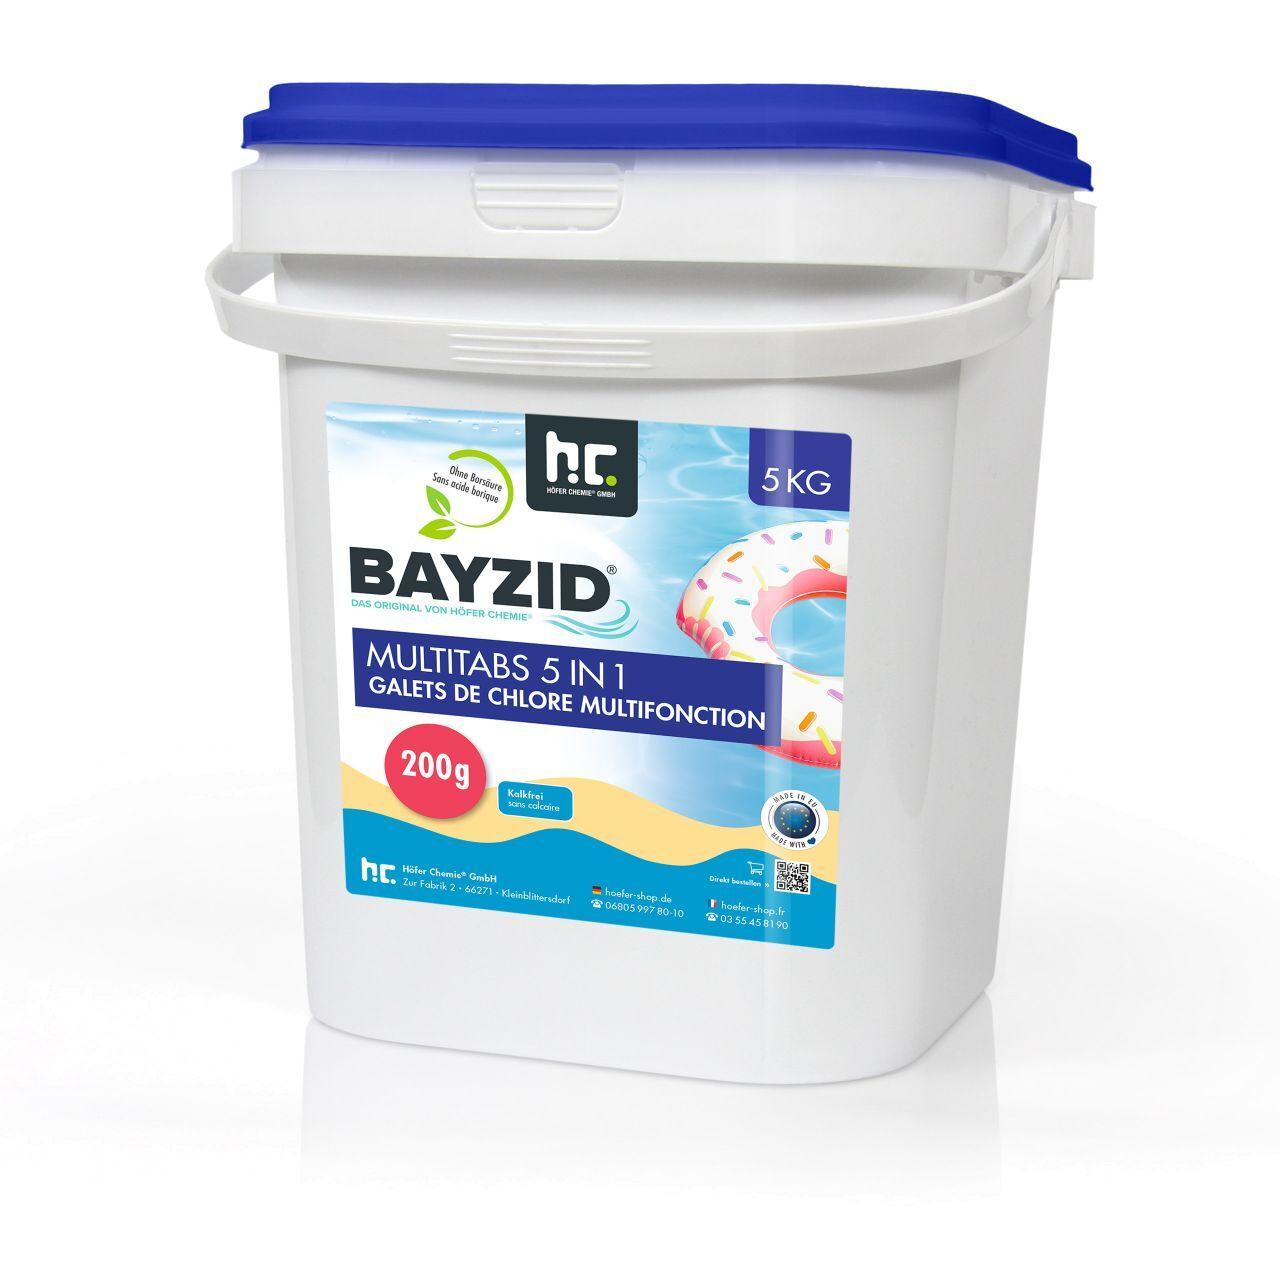 BAYZID 20 kg Bayzid® Galets de chlore multifonction (200g) (4 x 5 kg)